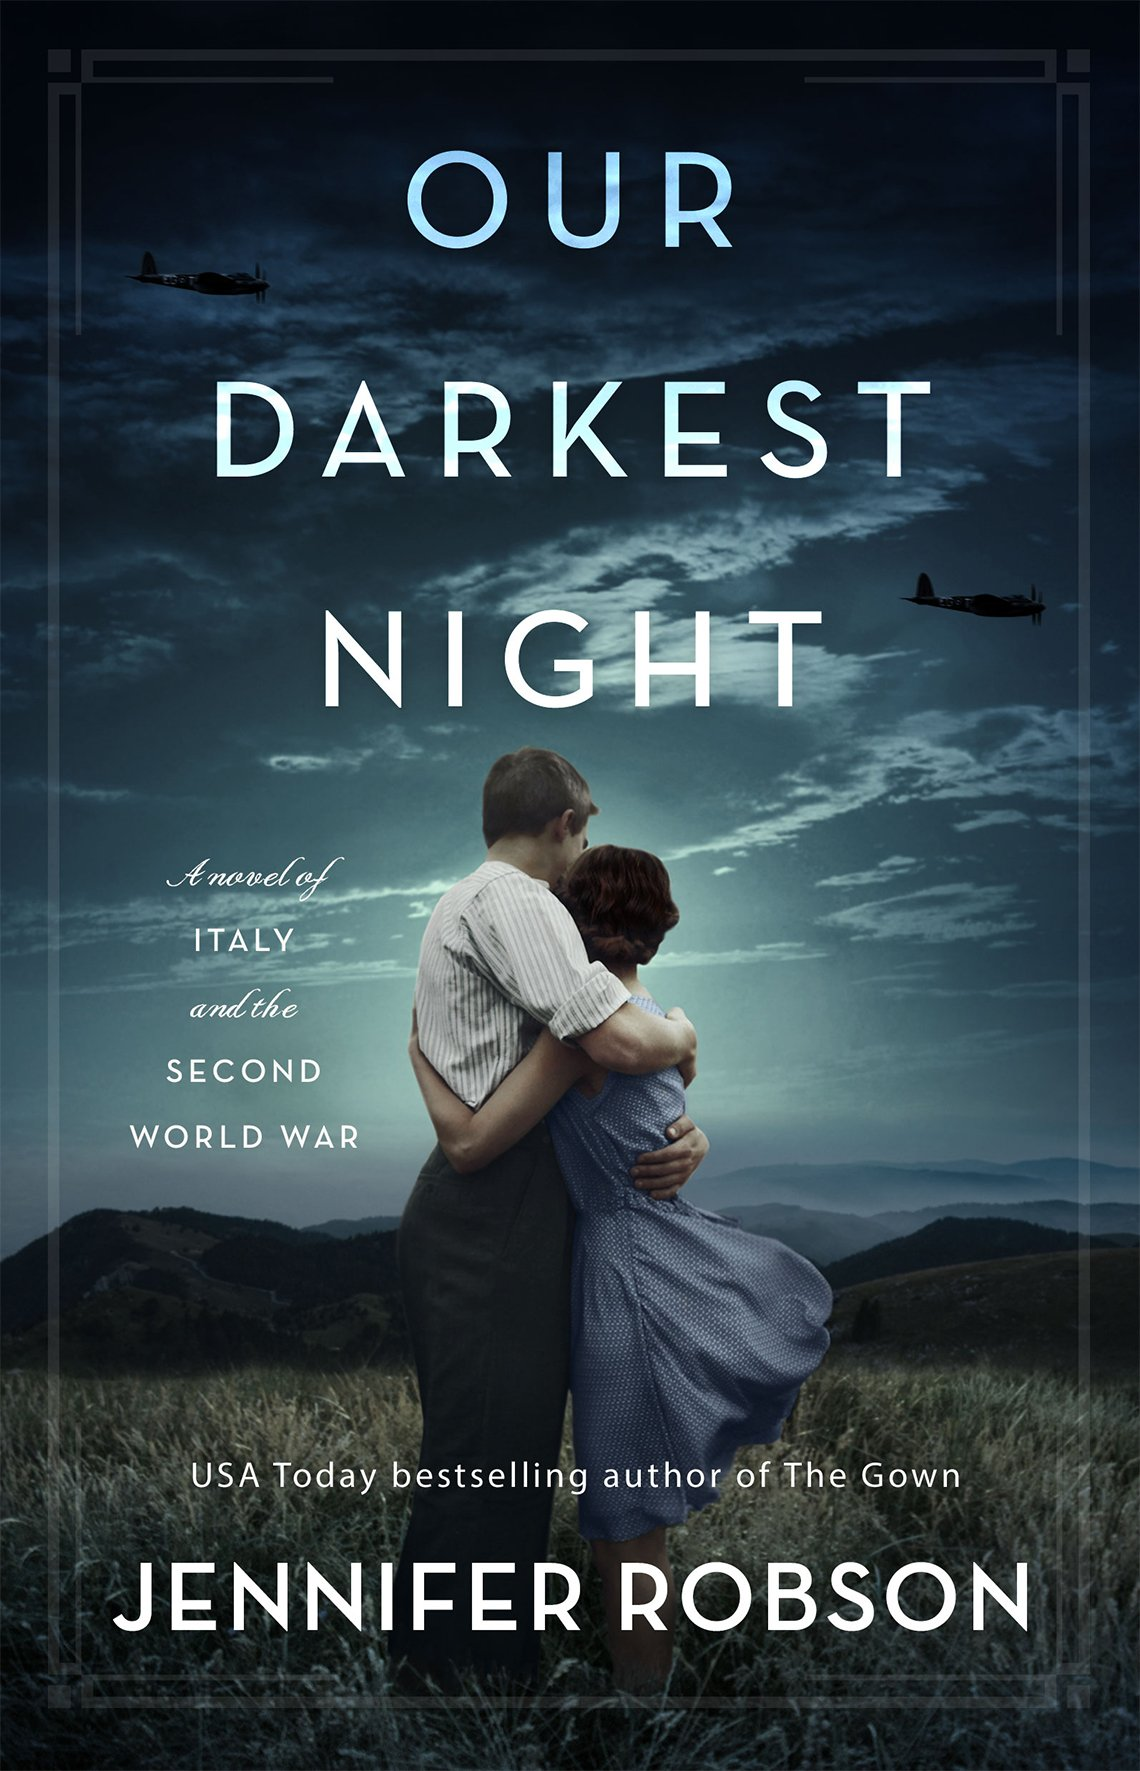 Portada del libro Our Darkest Night de Jennifer Robson.